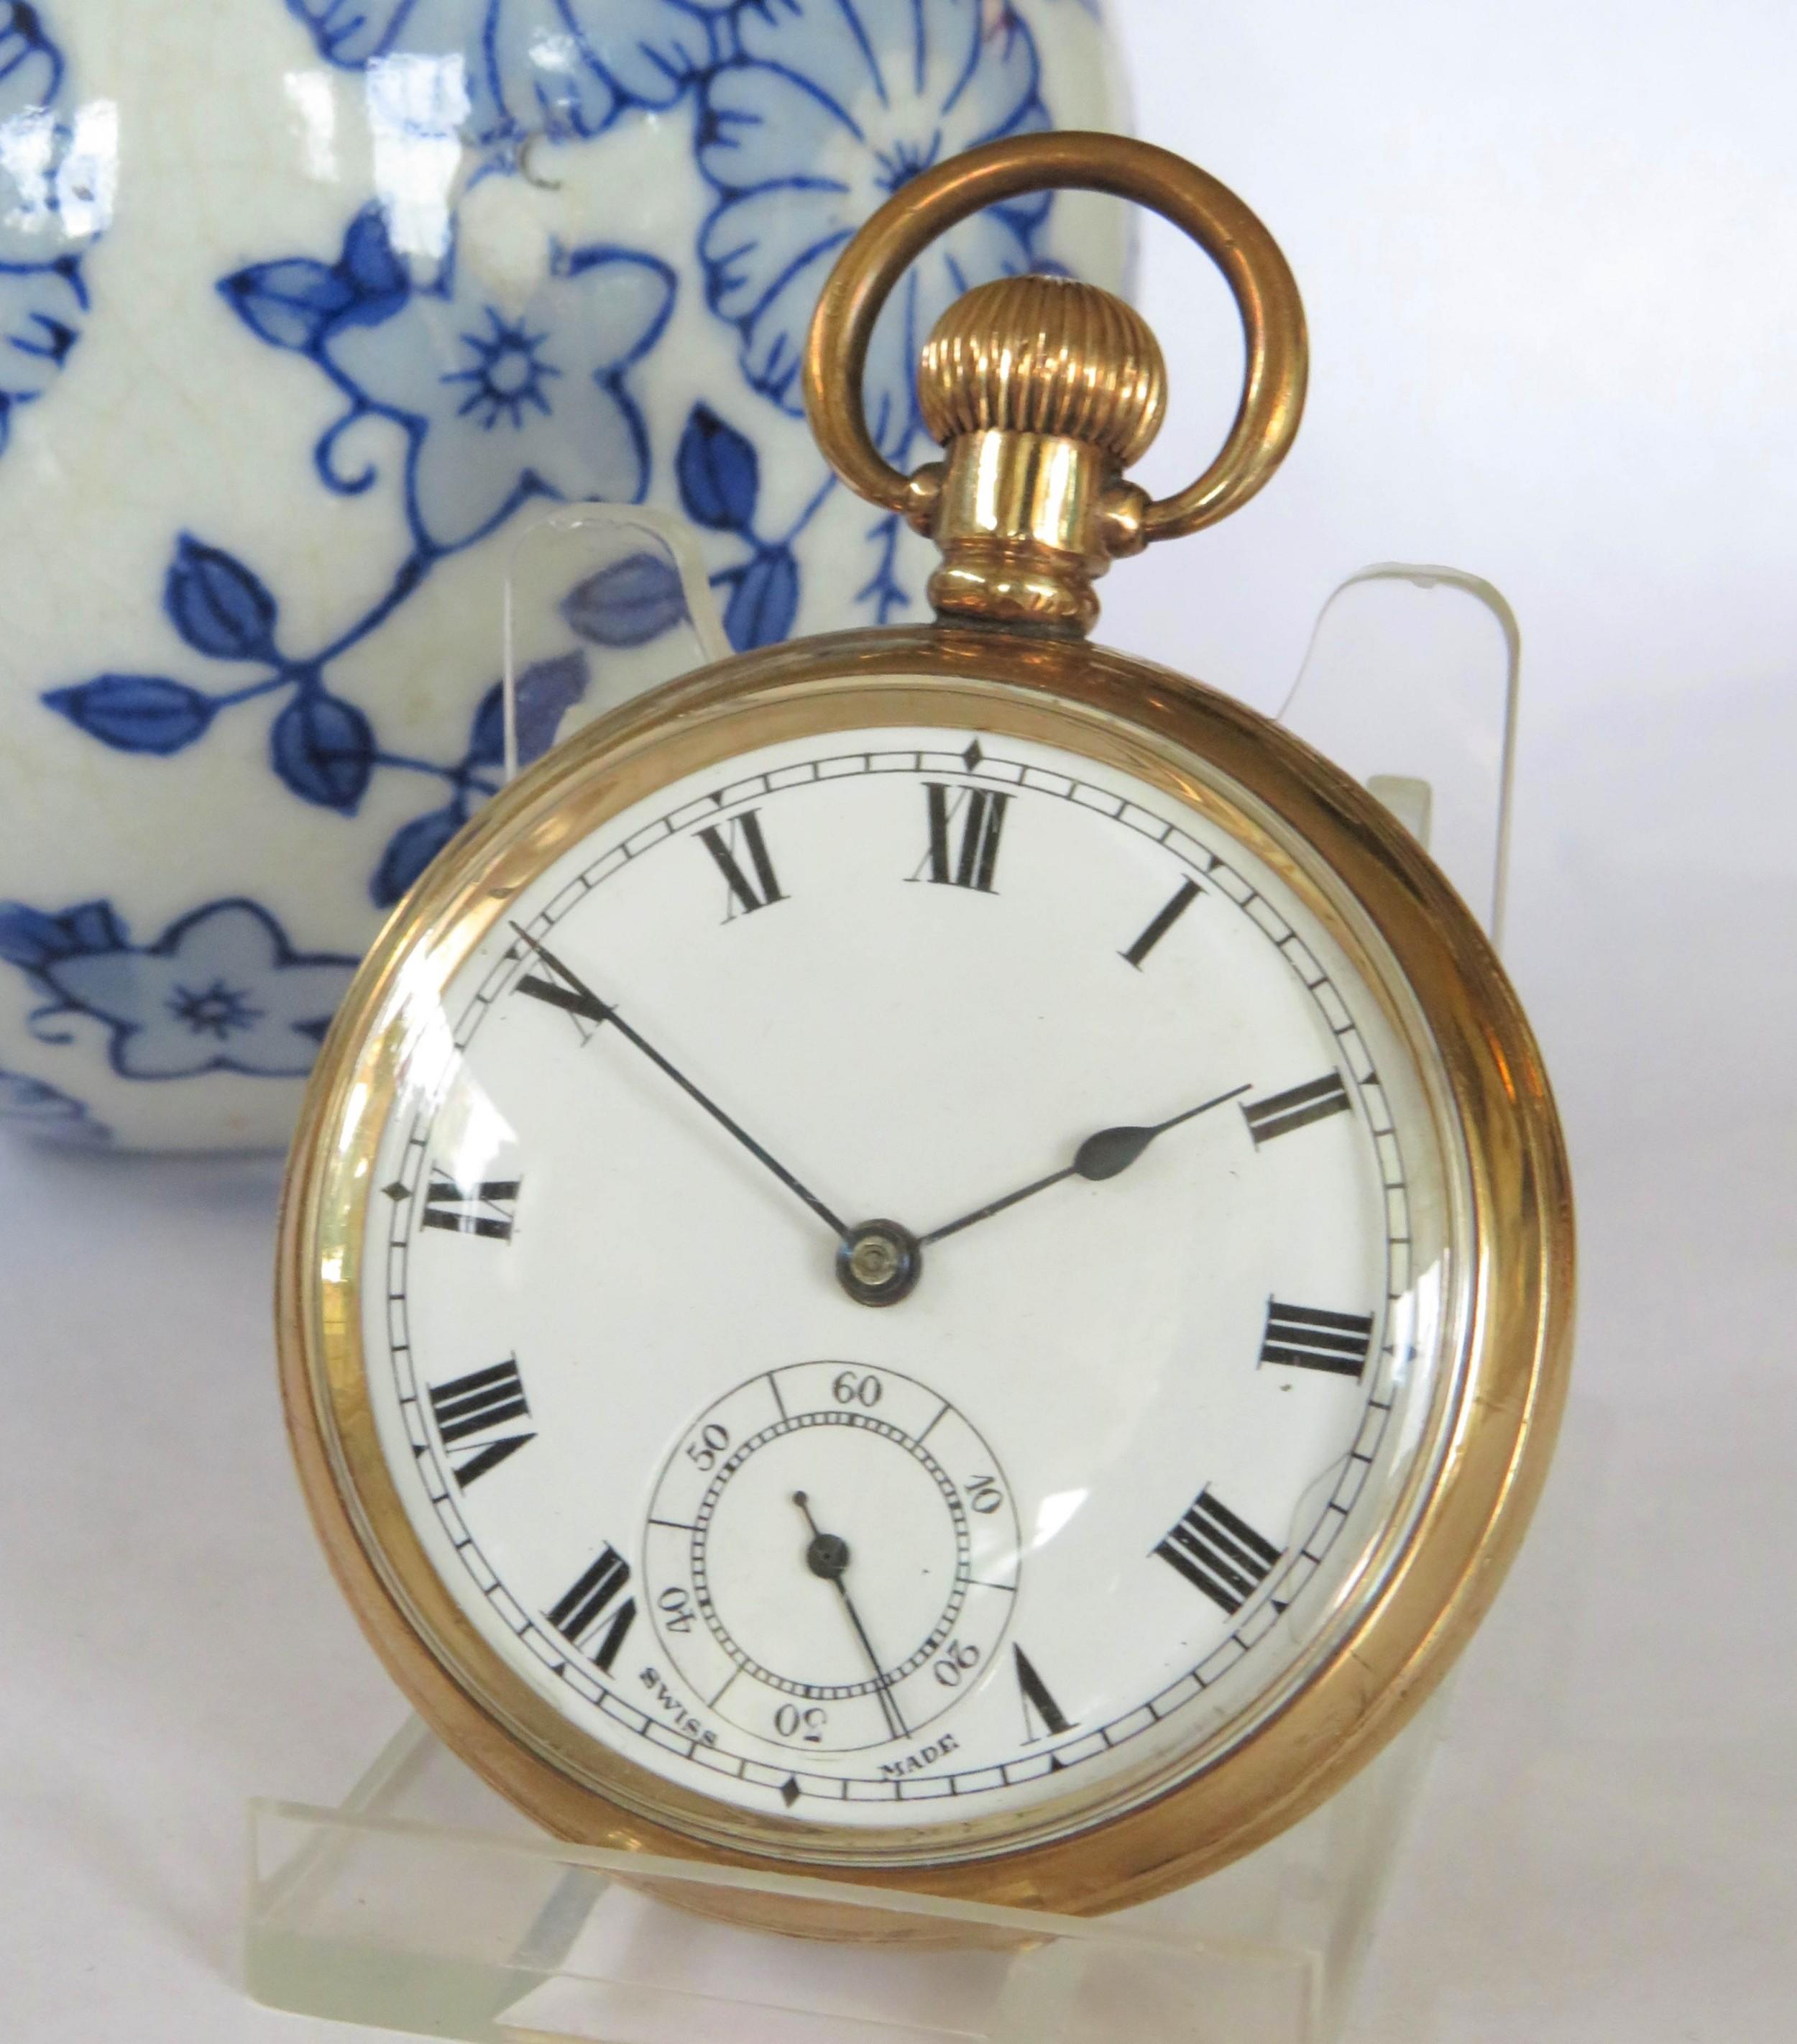 1930s swiss pocket watch